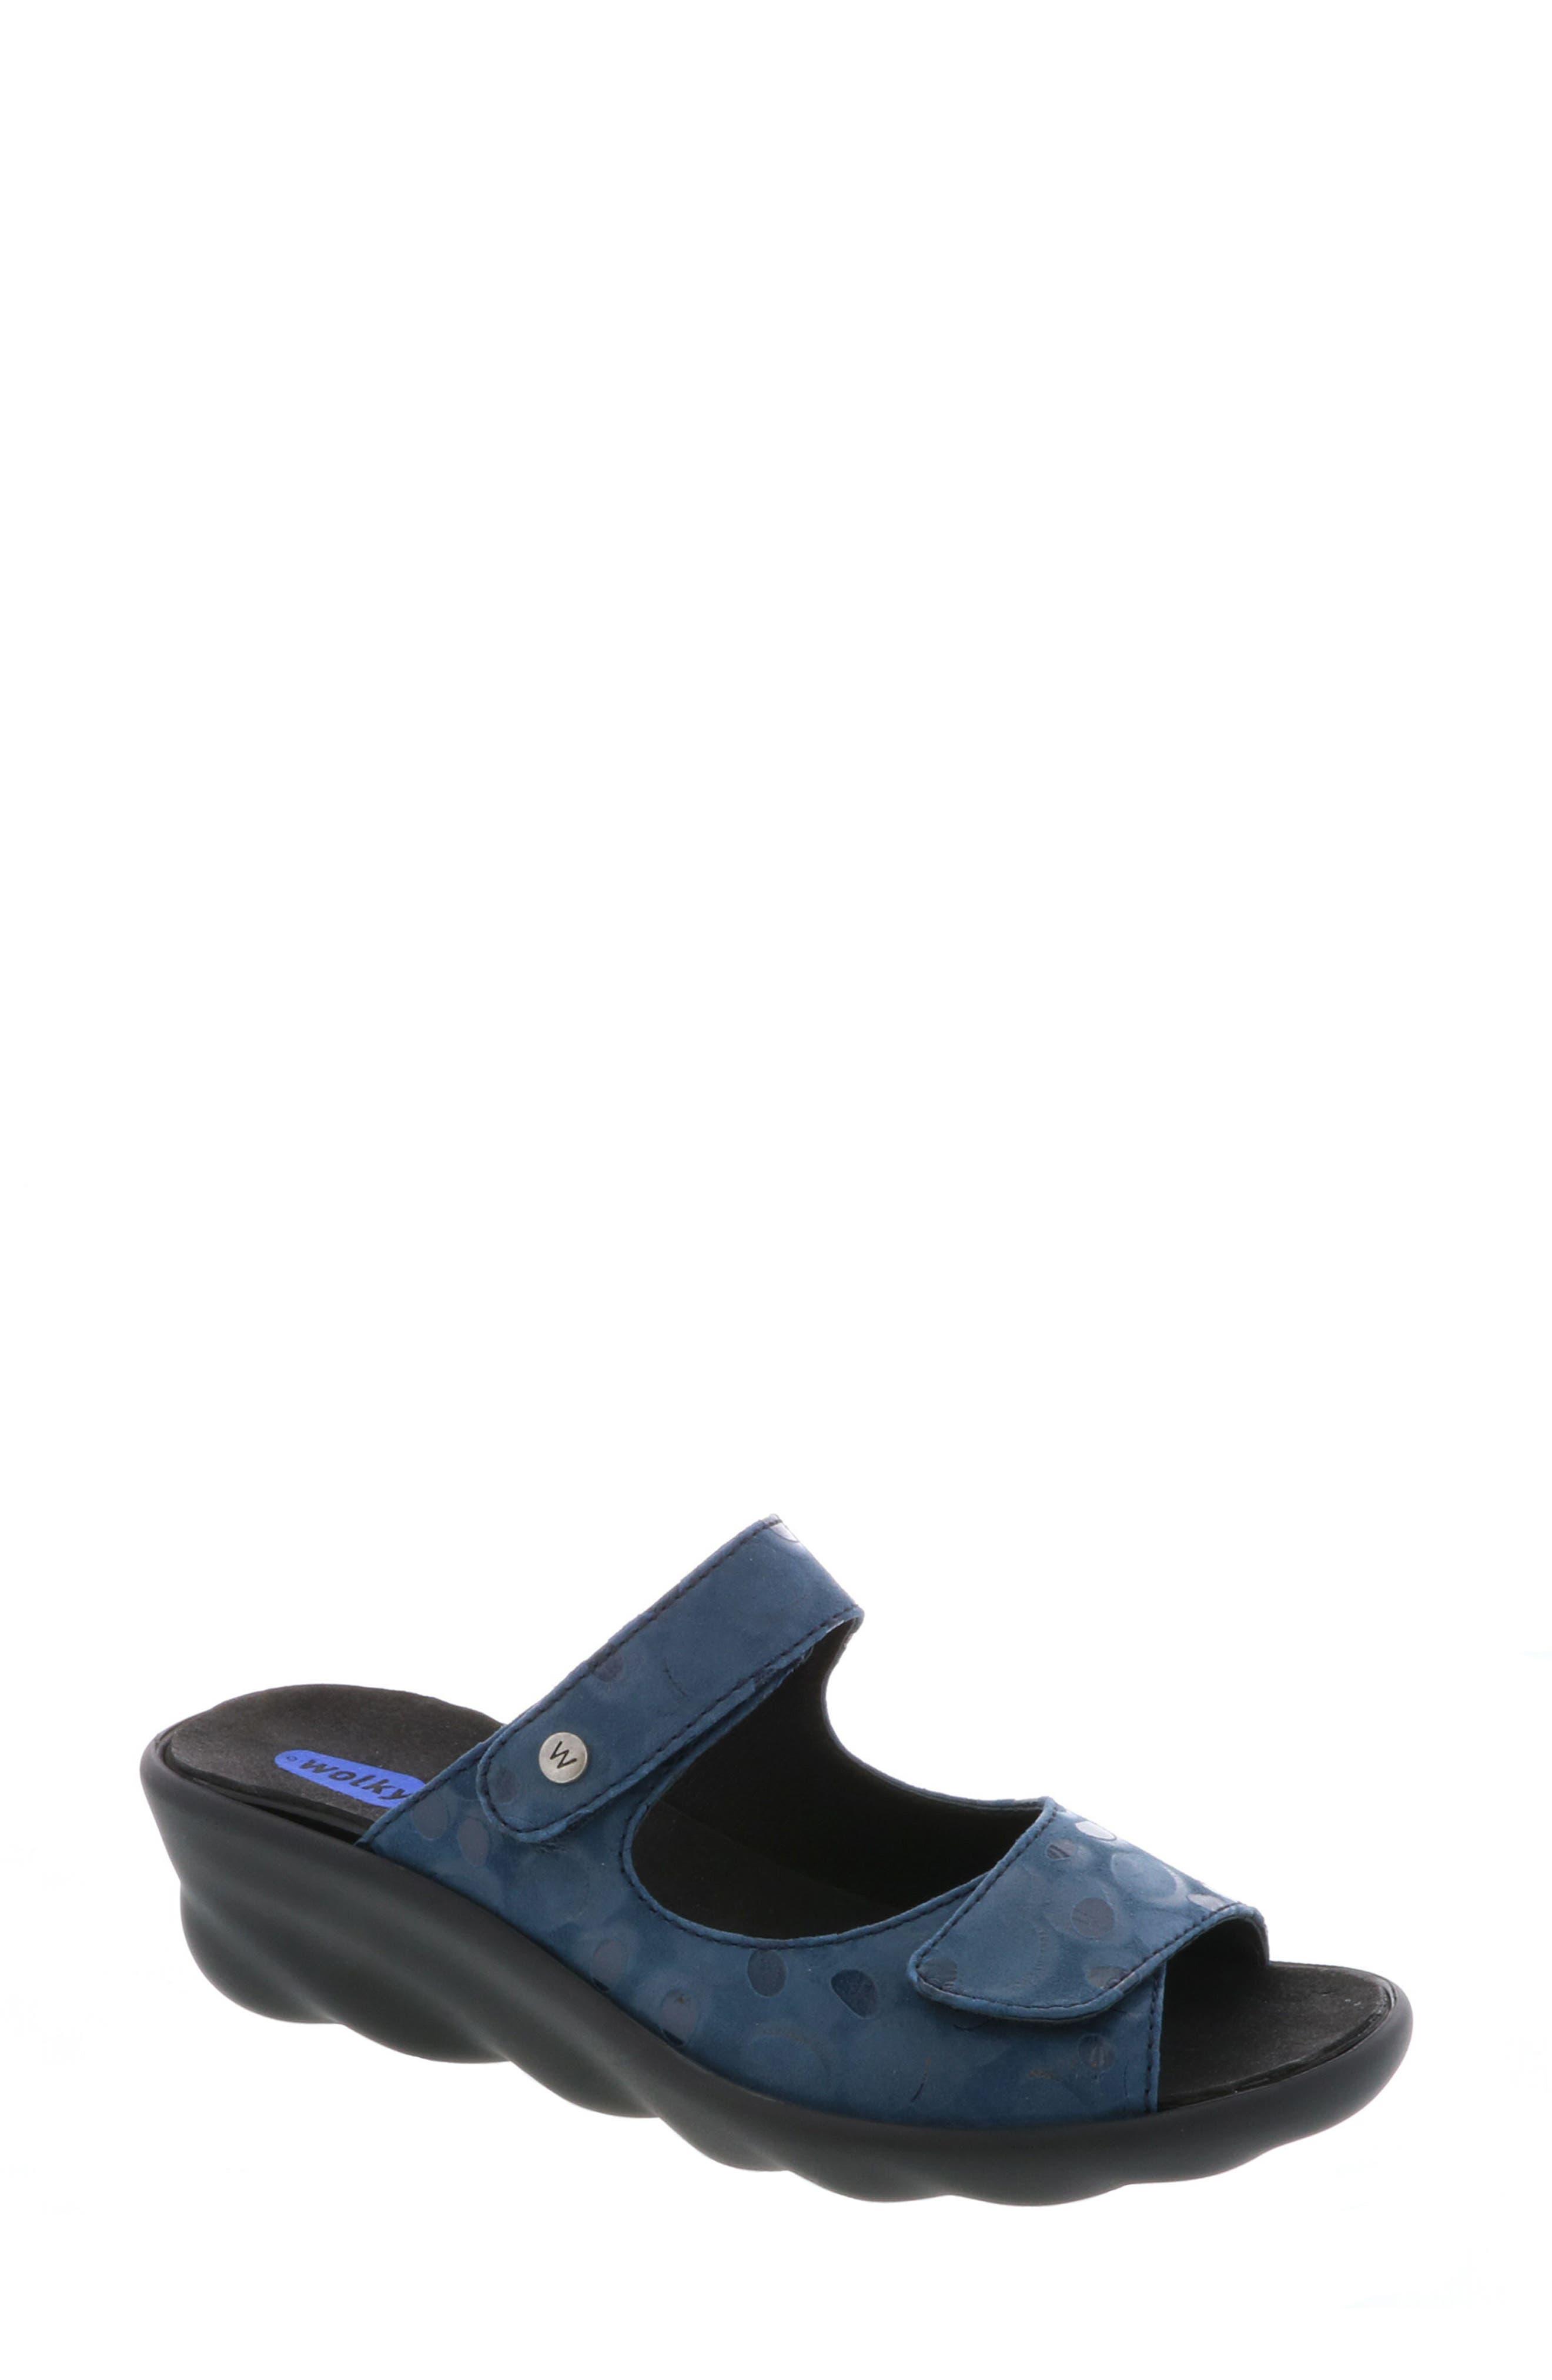 Bolena Slide Sandal,                             Main thumbnail 1, color,                             Blue Circle Print